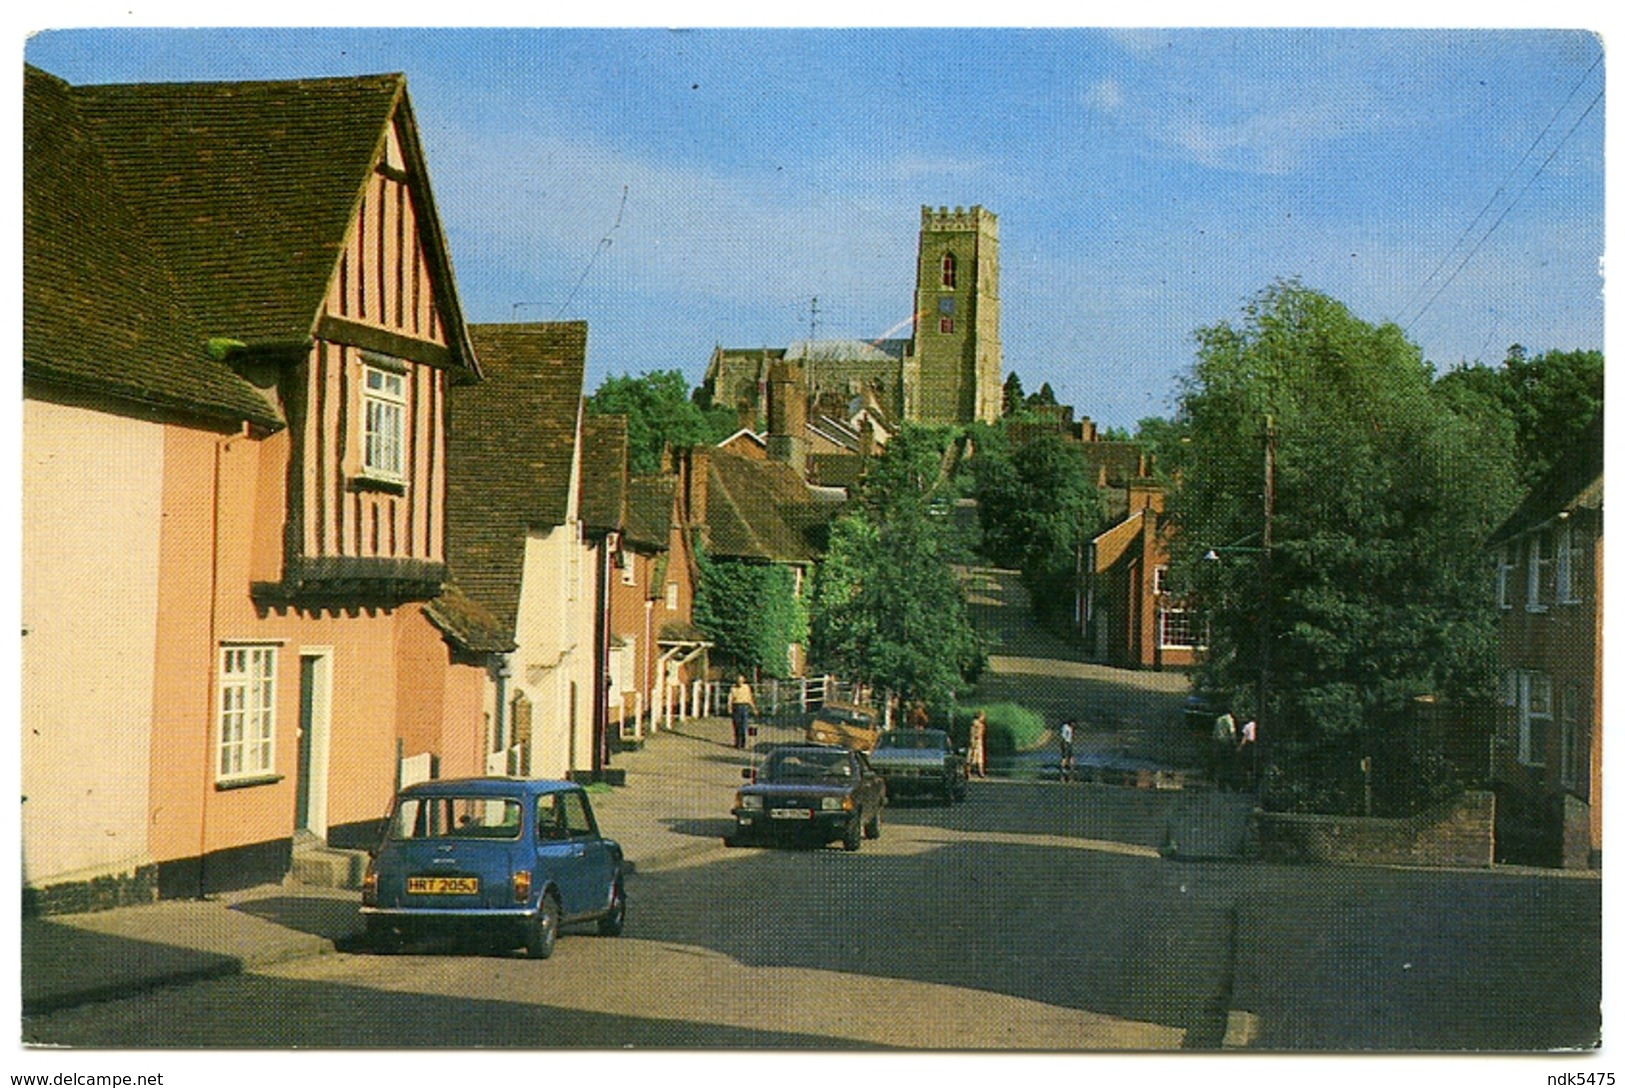 KERSEY : CHURCH HILL - Ipswich